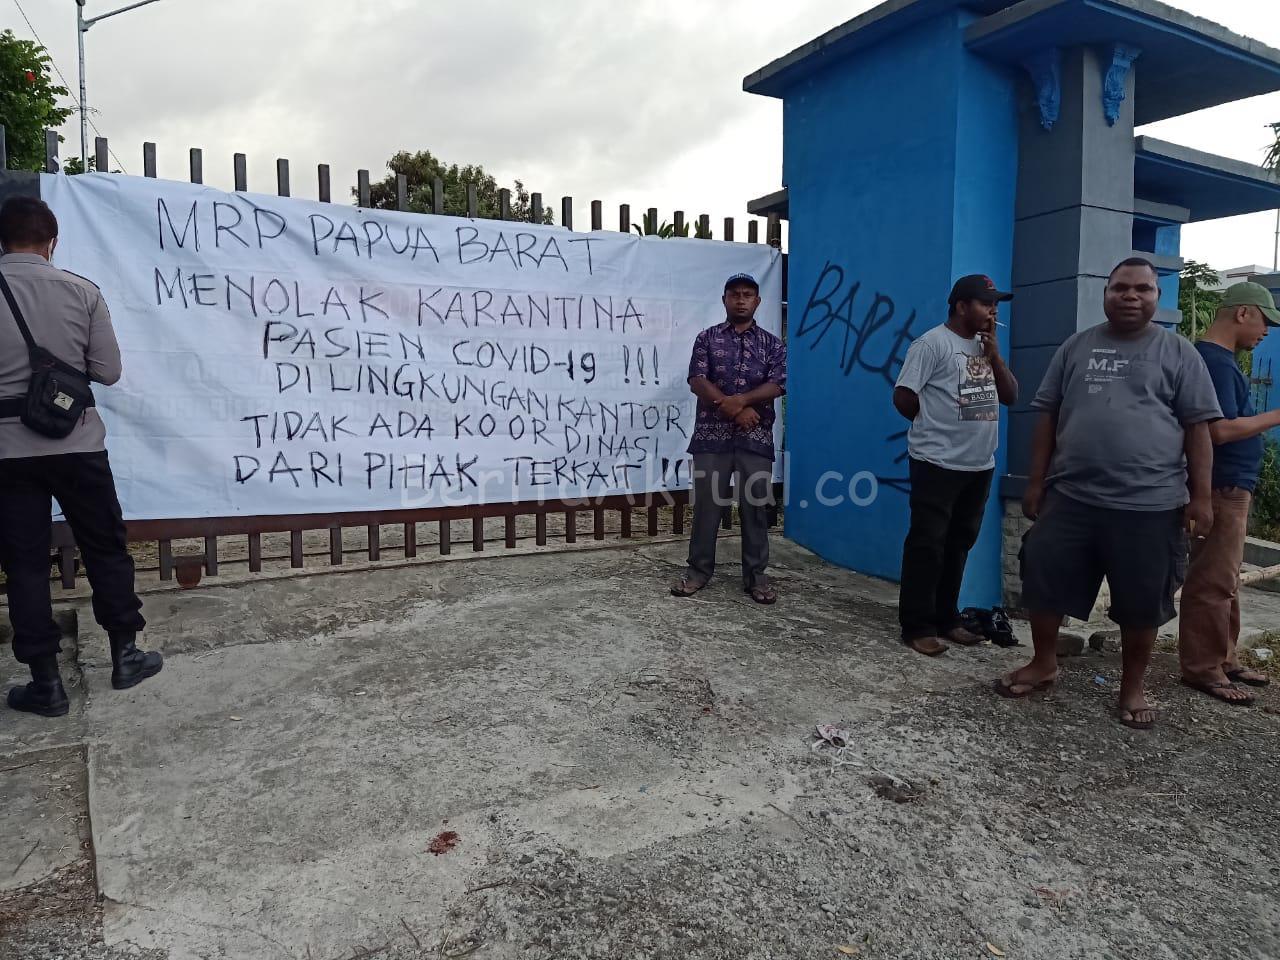 Hendak Diisolasi di Kantor Balai UMKM, Warga Manokwari Tolak 2 Pasien COVID-19 2 IMG 20200417 WA0029